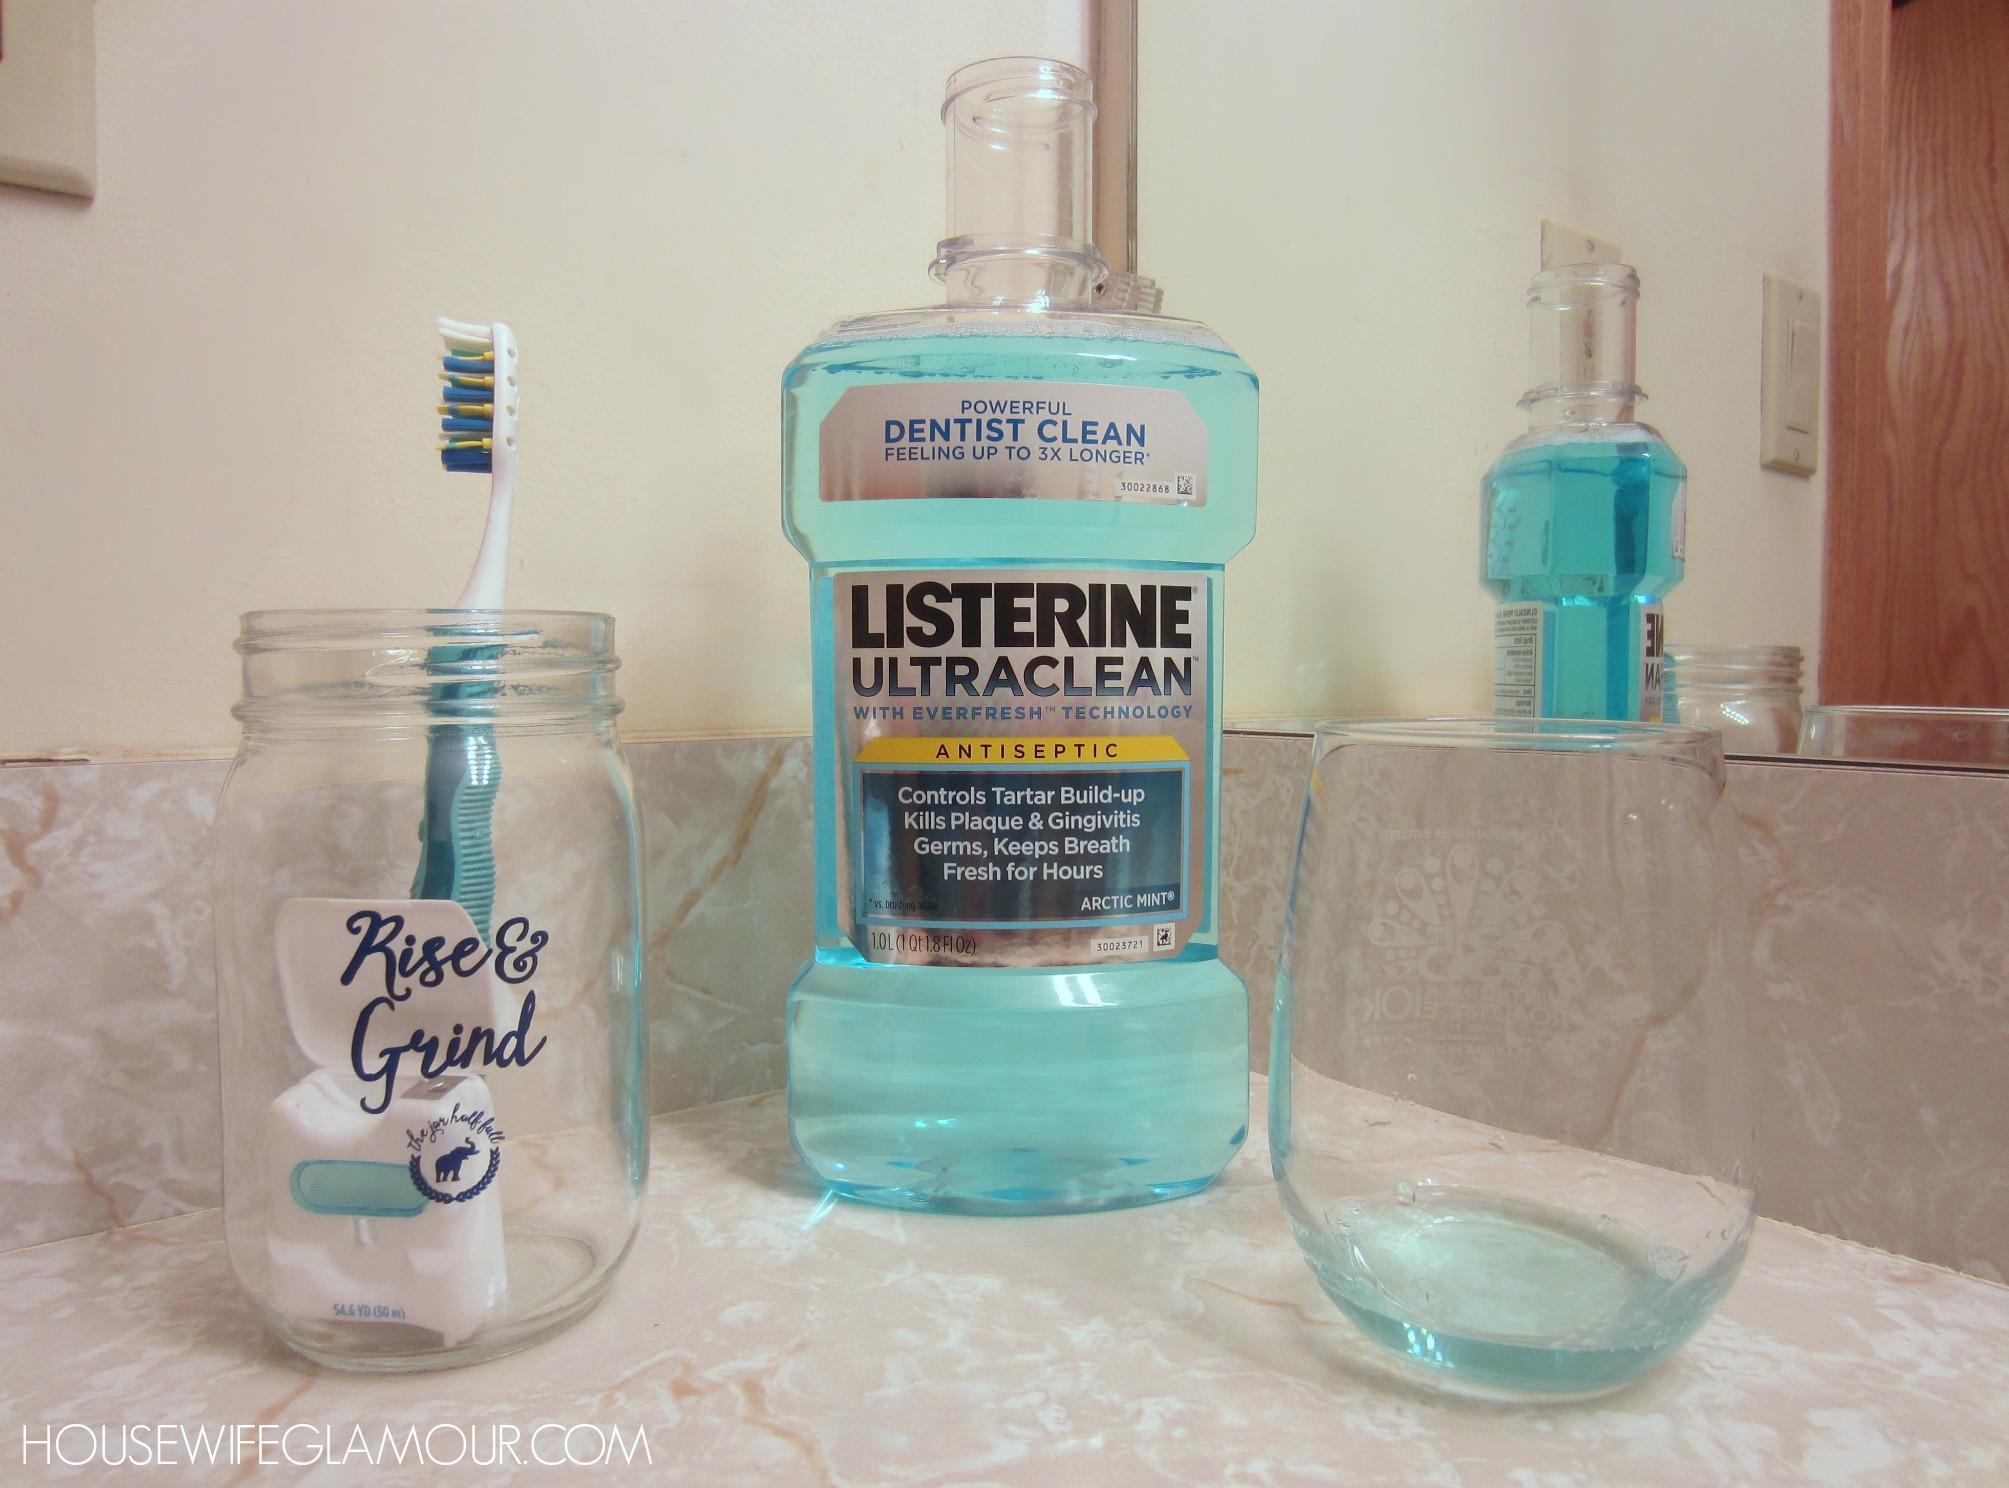 Listering Antiseptic mouthwash routine